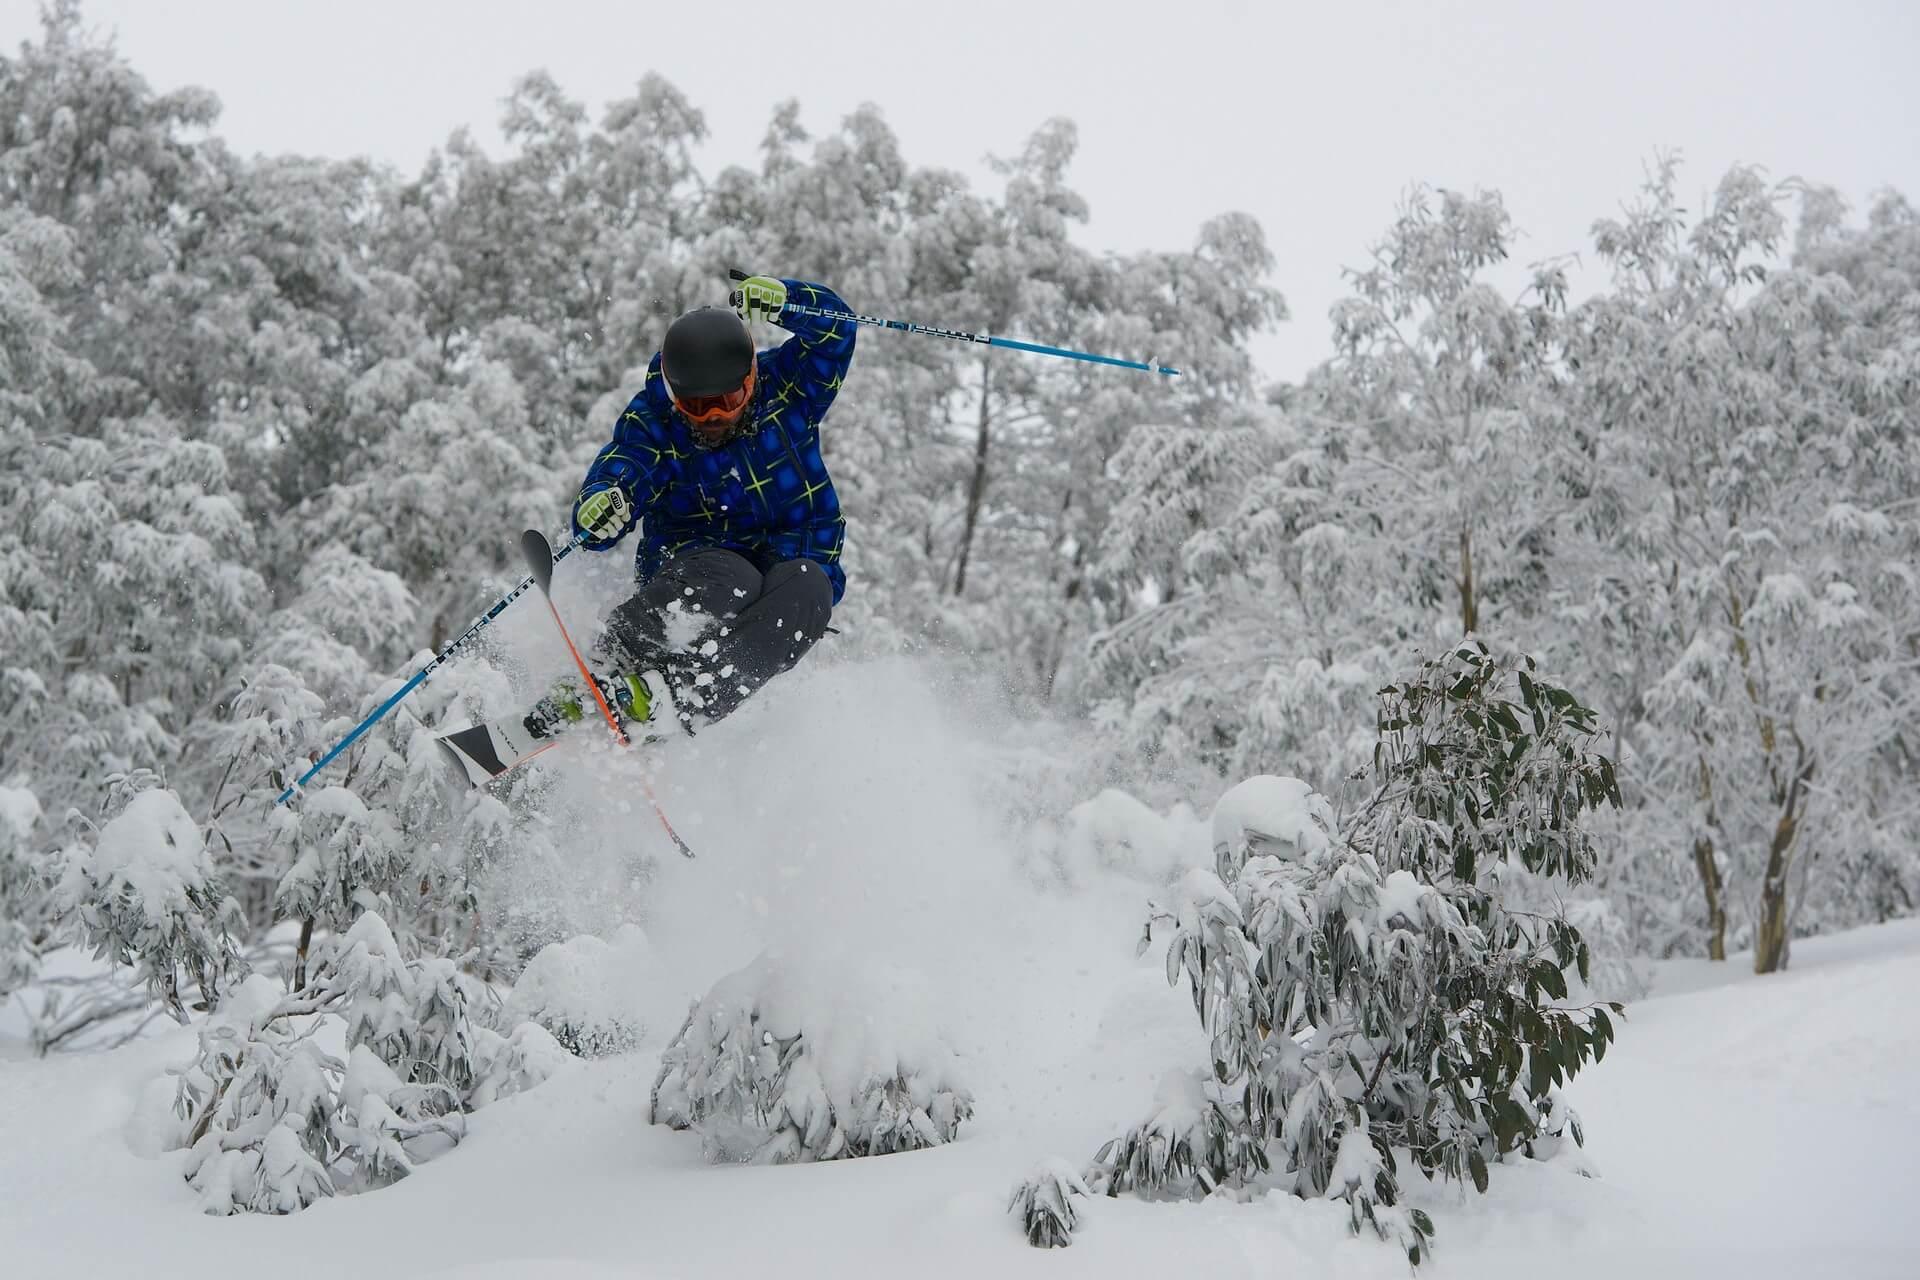 FallsCreek_fc15_Hero skiing Laif Moegel